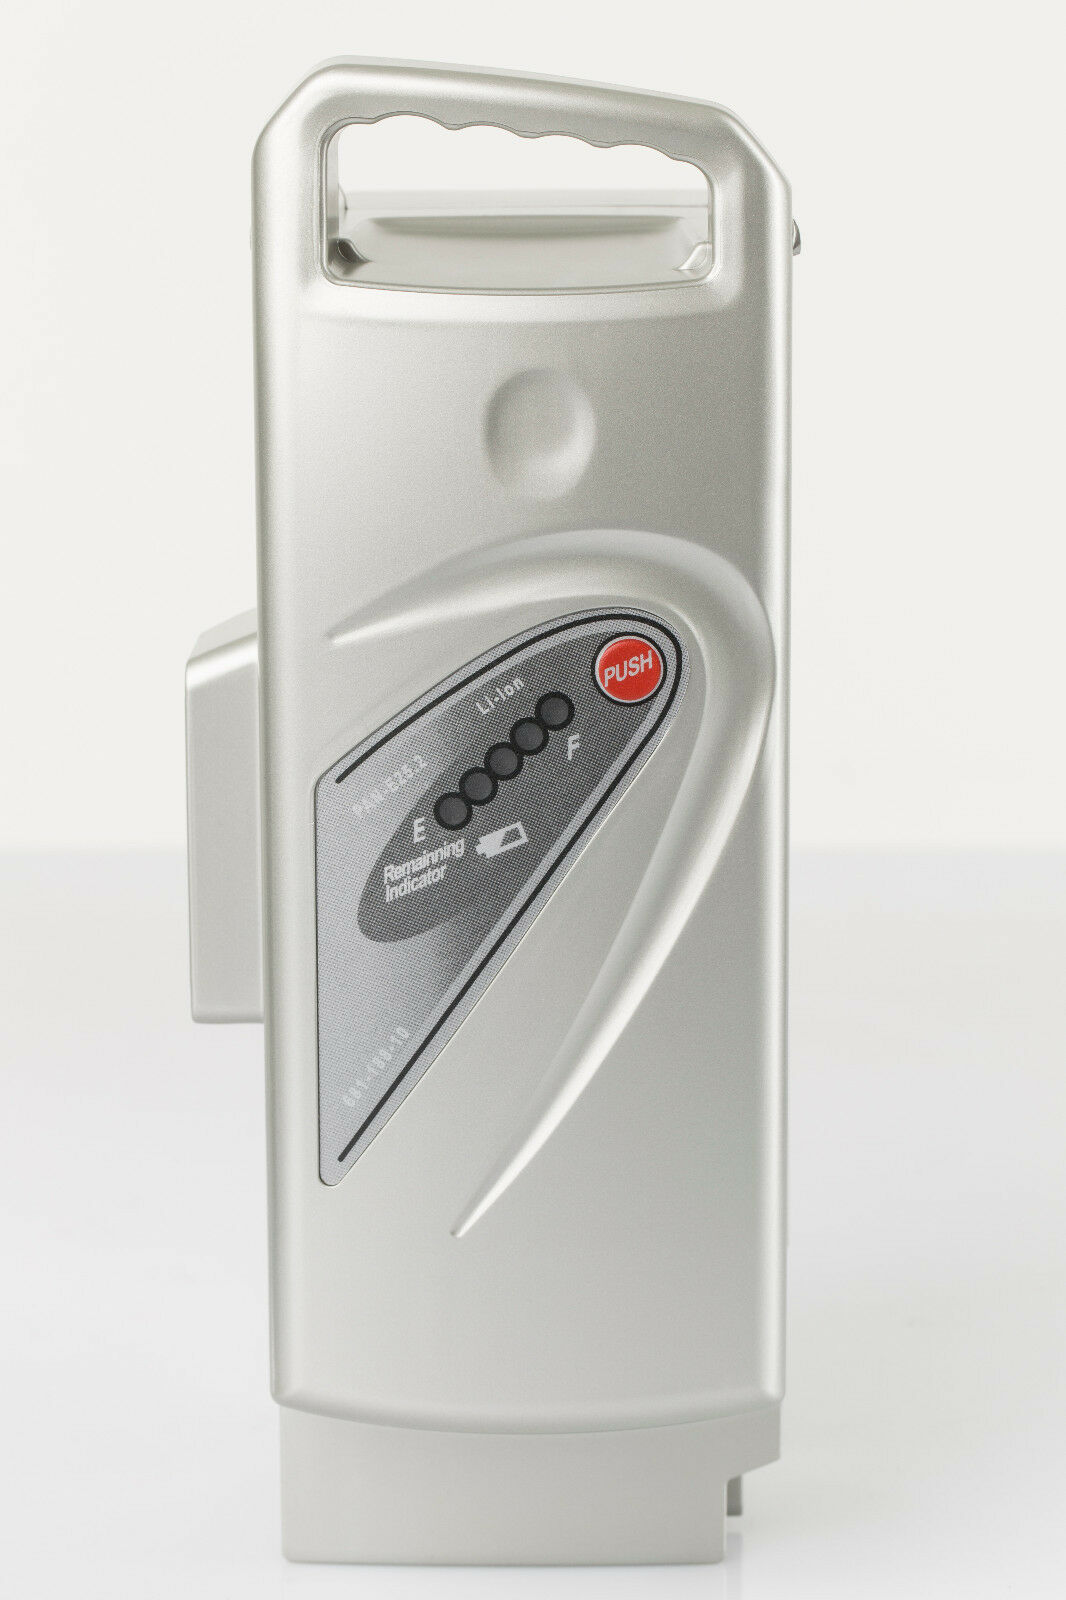 605Wh 24AH LiIon Akku für Panasonic EBike 26V Kalkhoff, Kettler, Flyer ab 2007